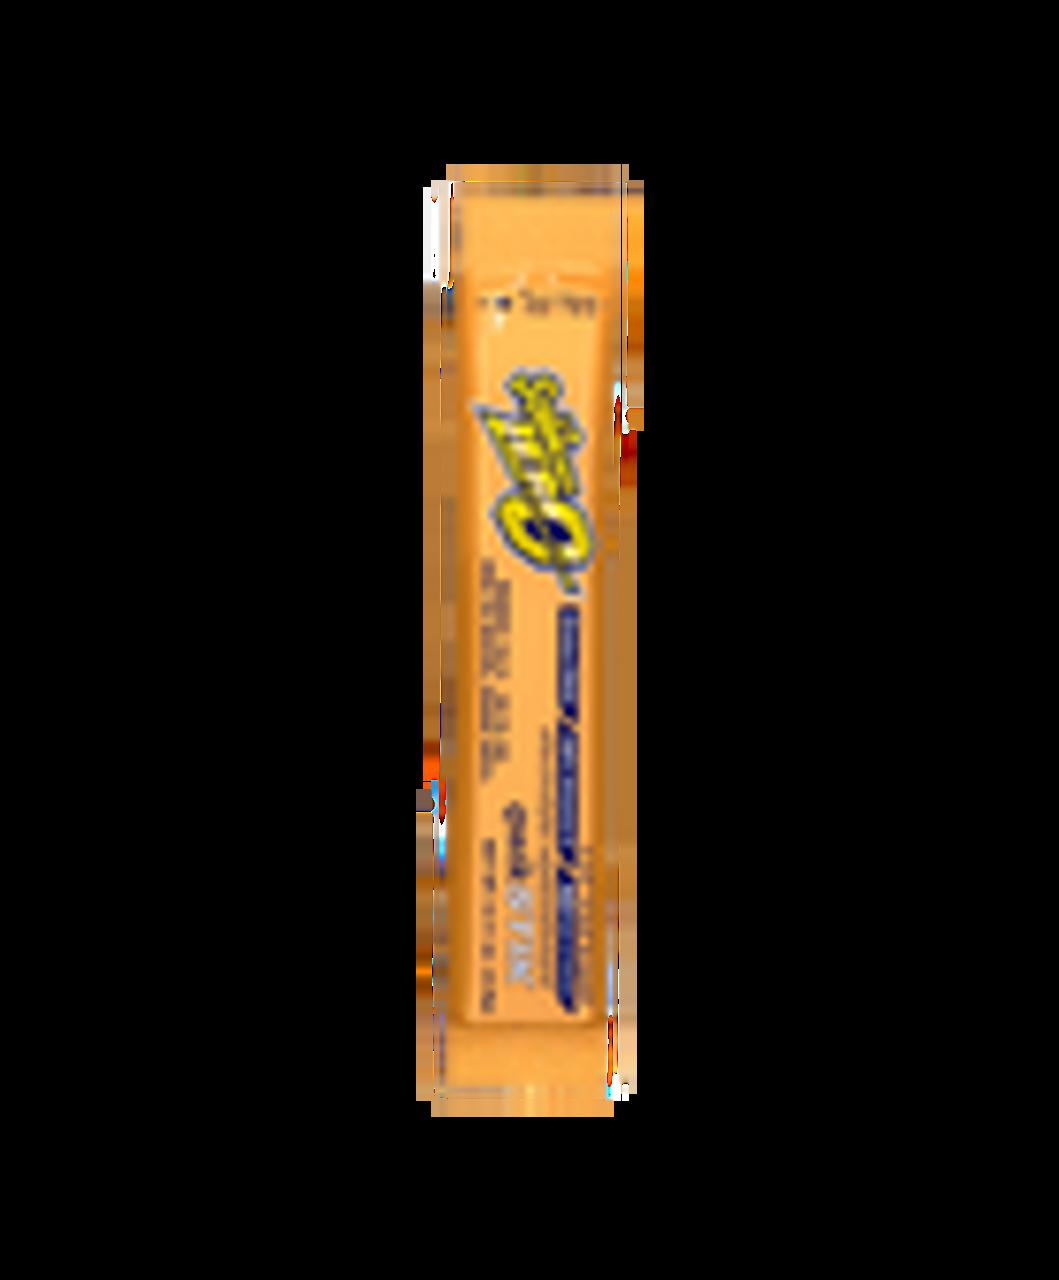 Sqwincher Stik Qwik Beverage 20Oz Yield Quik Stick Zero -1 Pack of 50